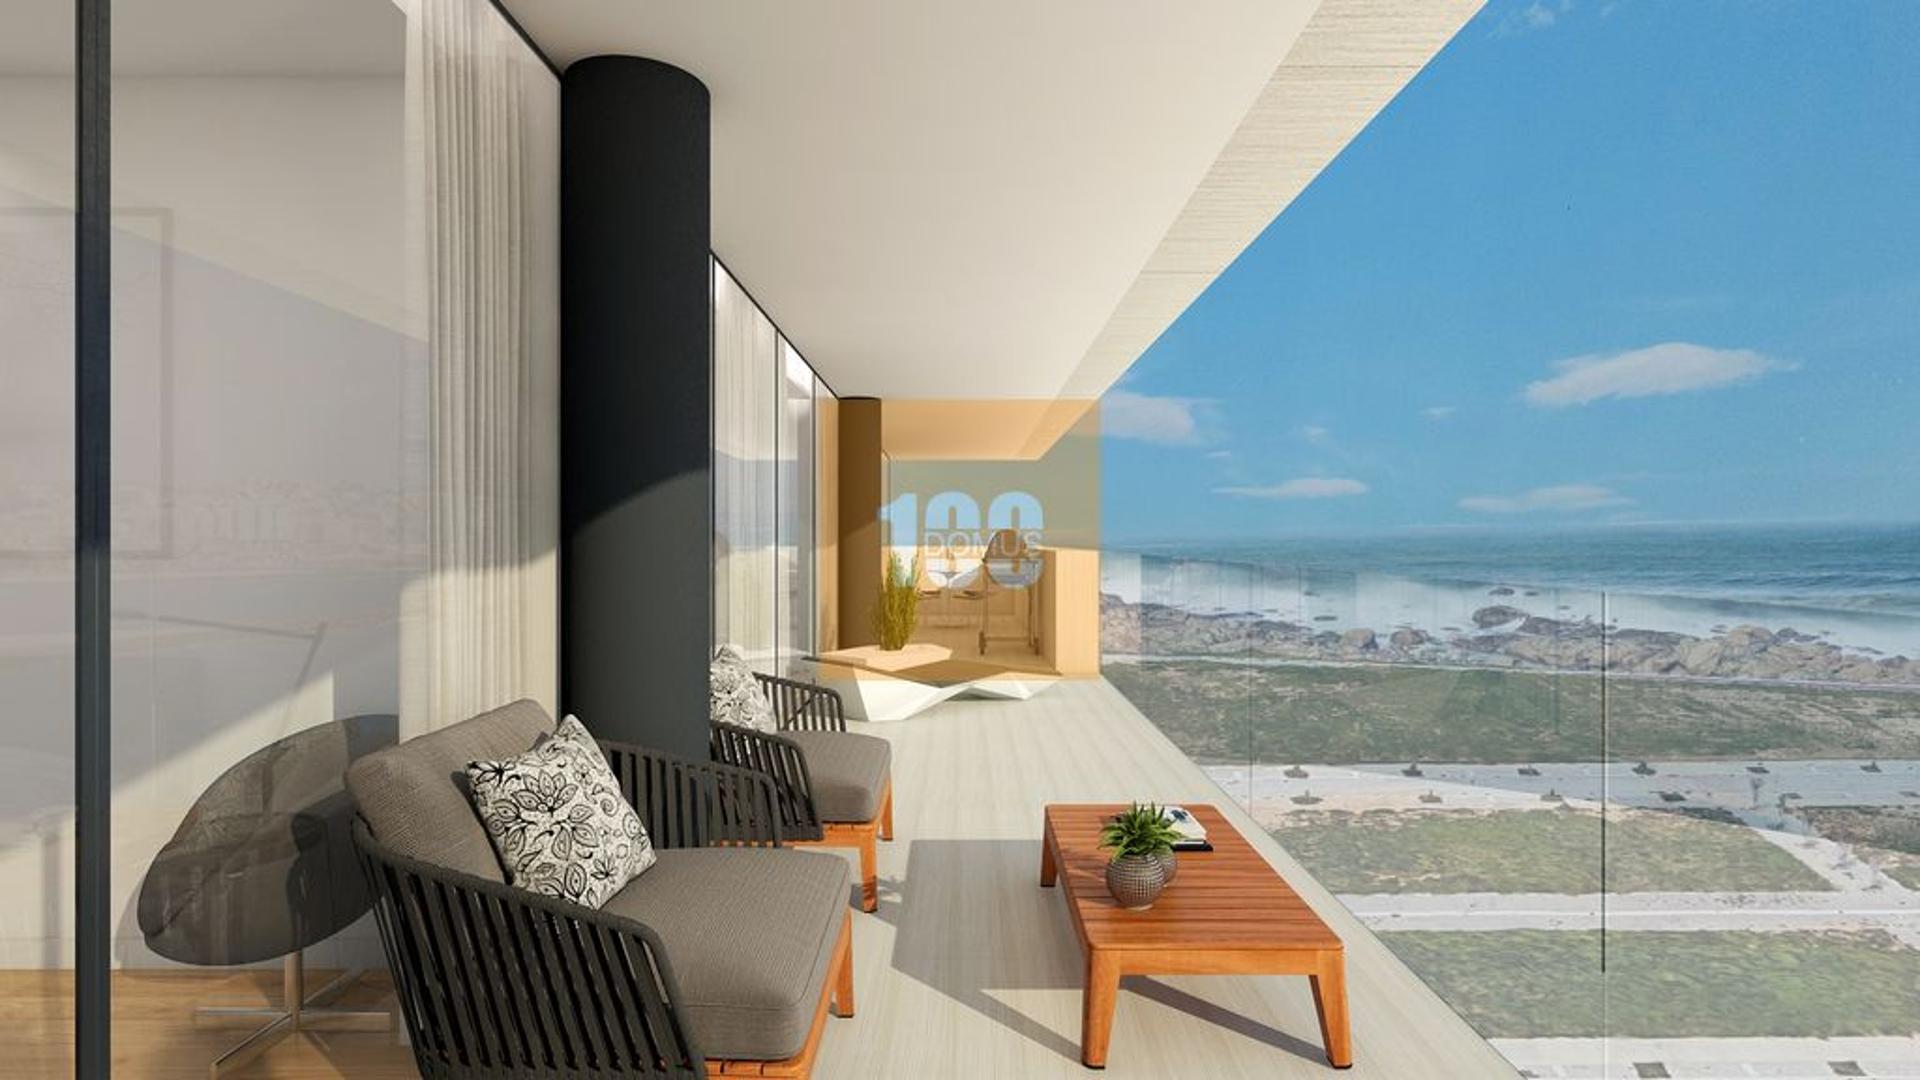 T4 novo - Douro Atlântico  - Vila Nova De Gaia, Canidelo